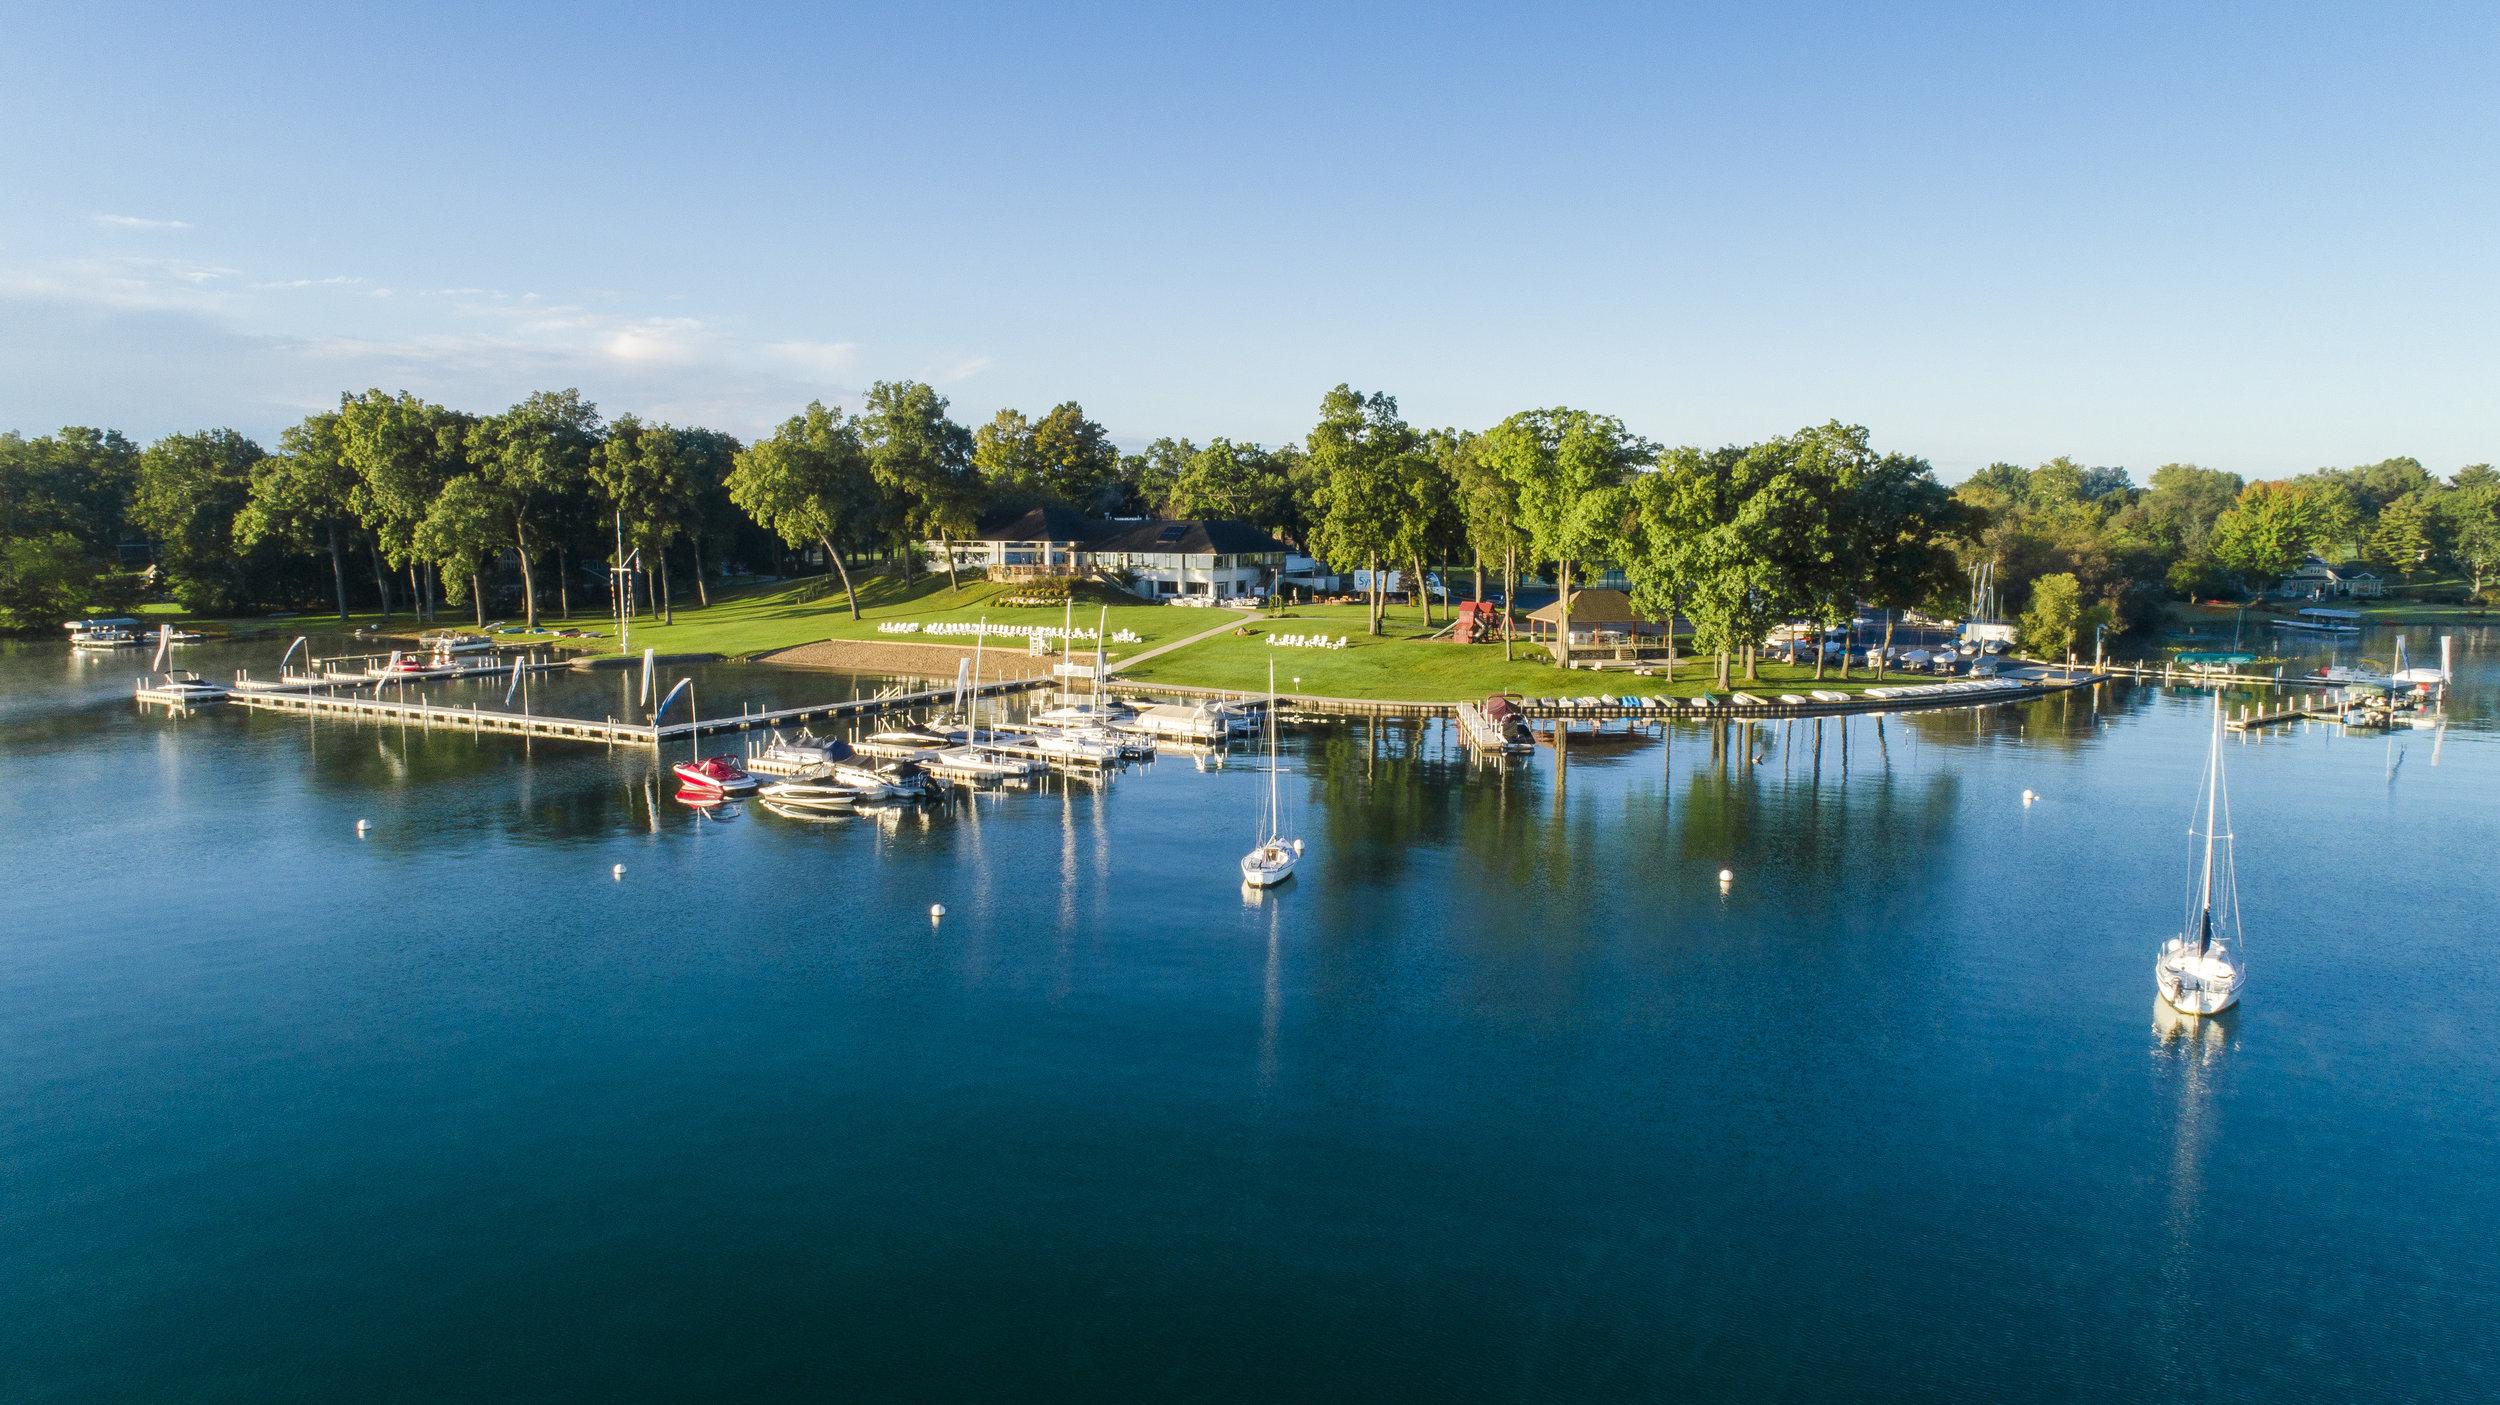 Gull Lake Country Club Drone